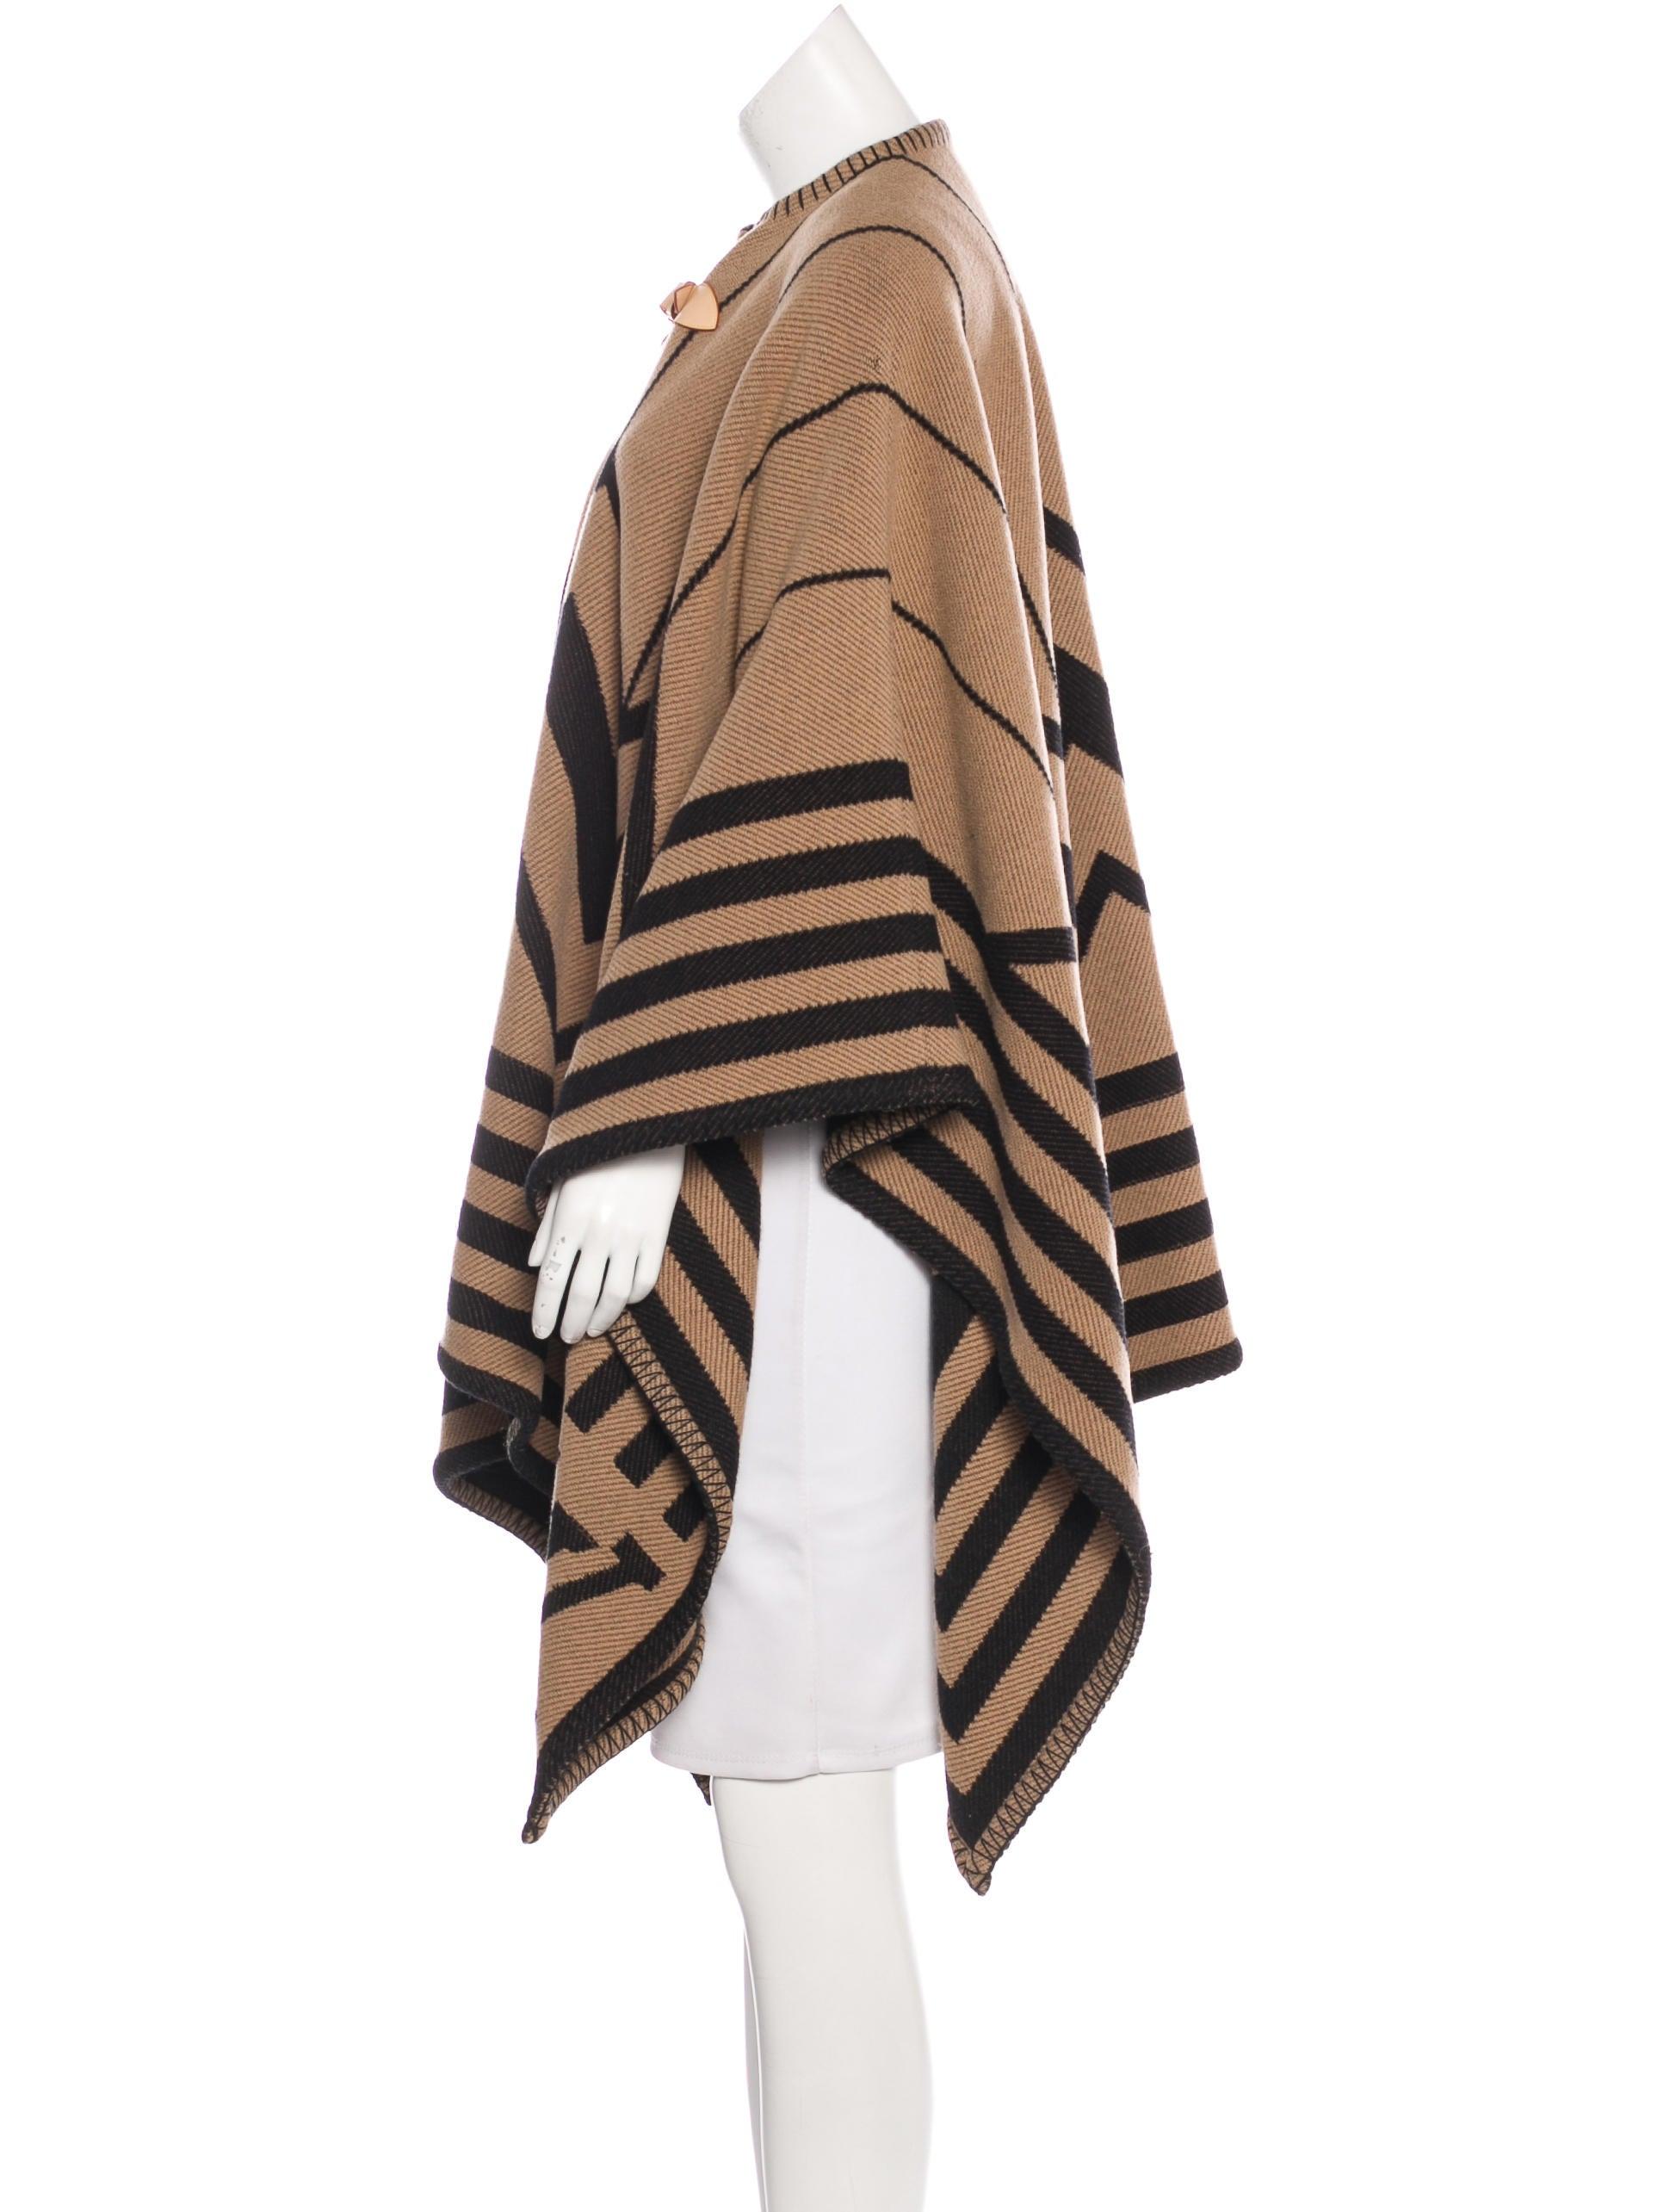 Book Cover Pattern Wool Cashmere Poncho : Louis vuitton karakoram cashmere wool blend poncho